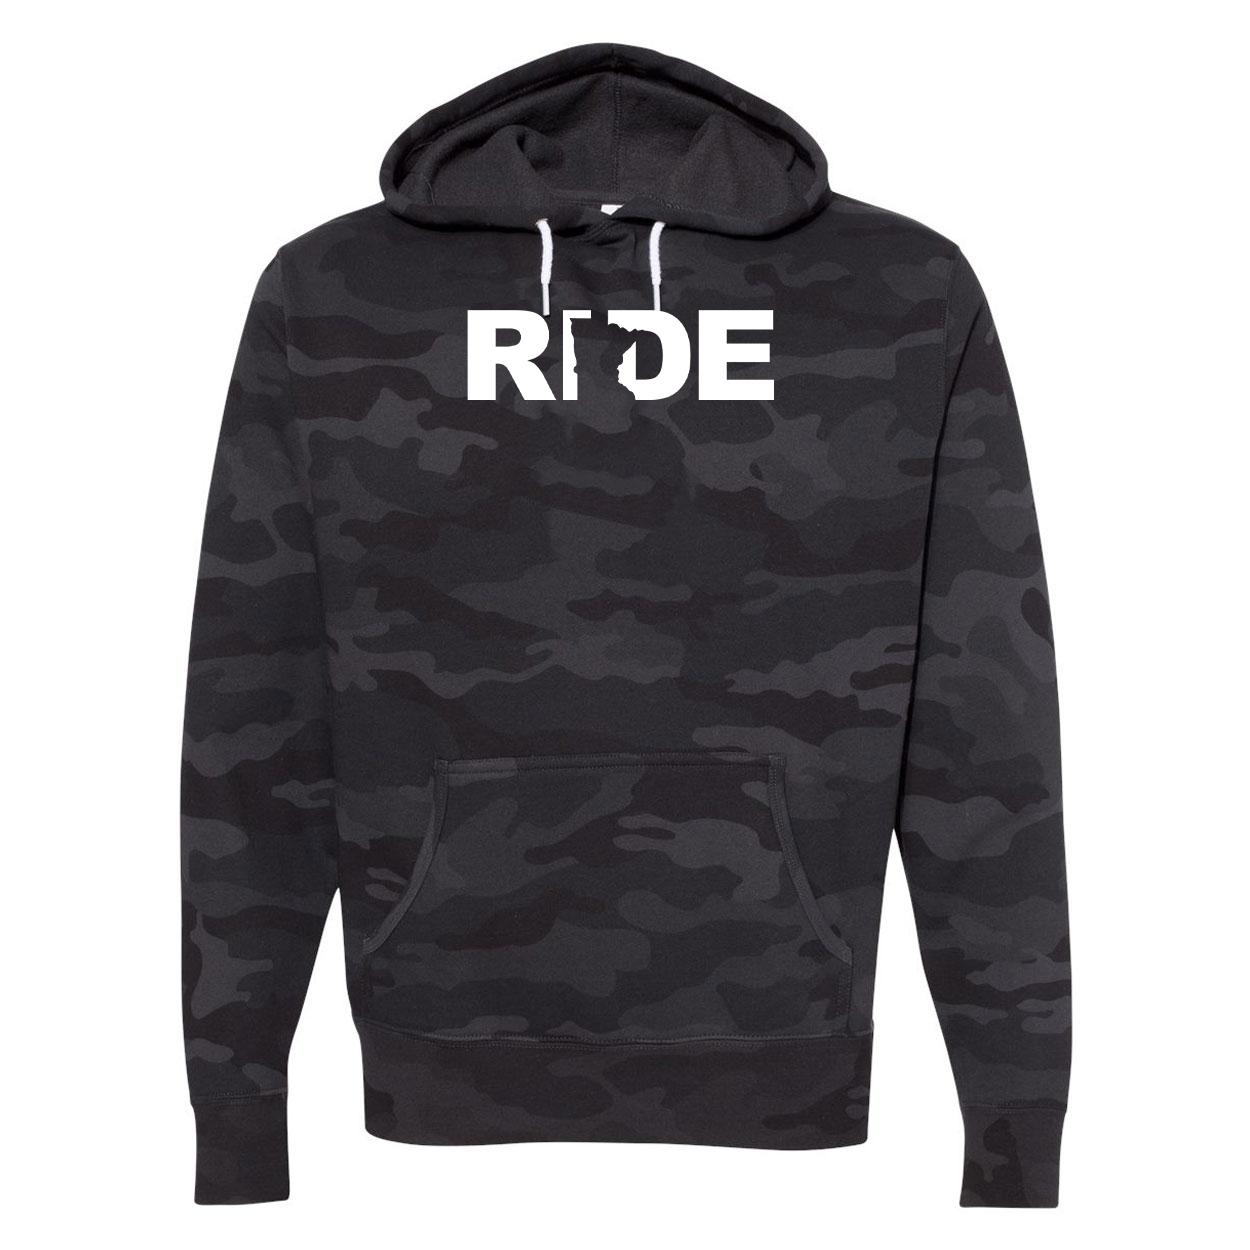 Ride Minnesota Classic Unisex Hooded Sweatshirt Black Camo (White Logo)